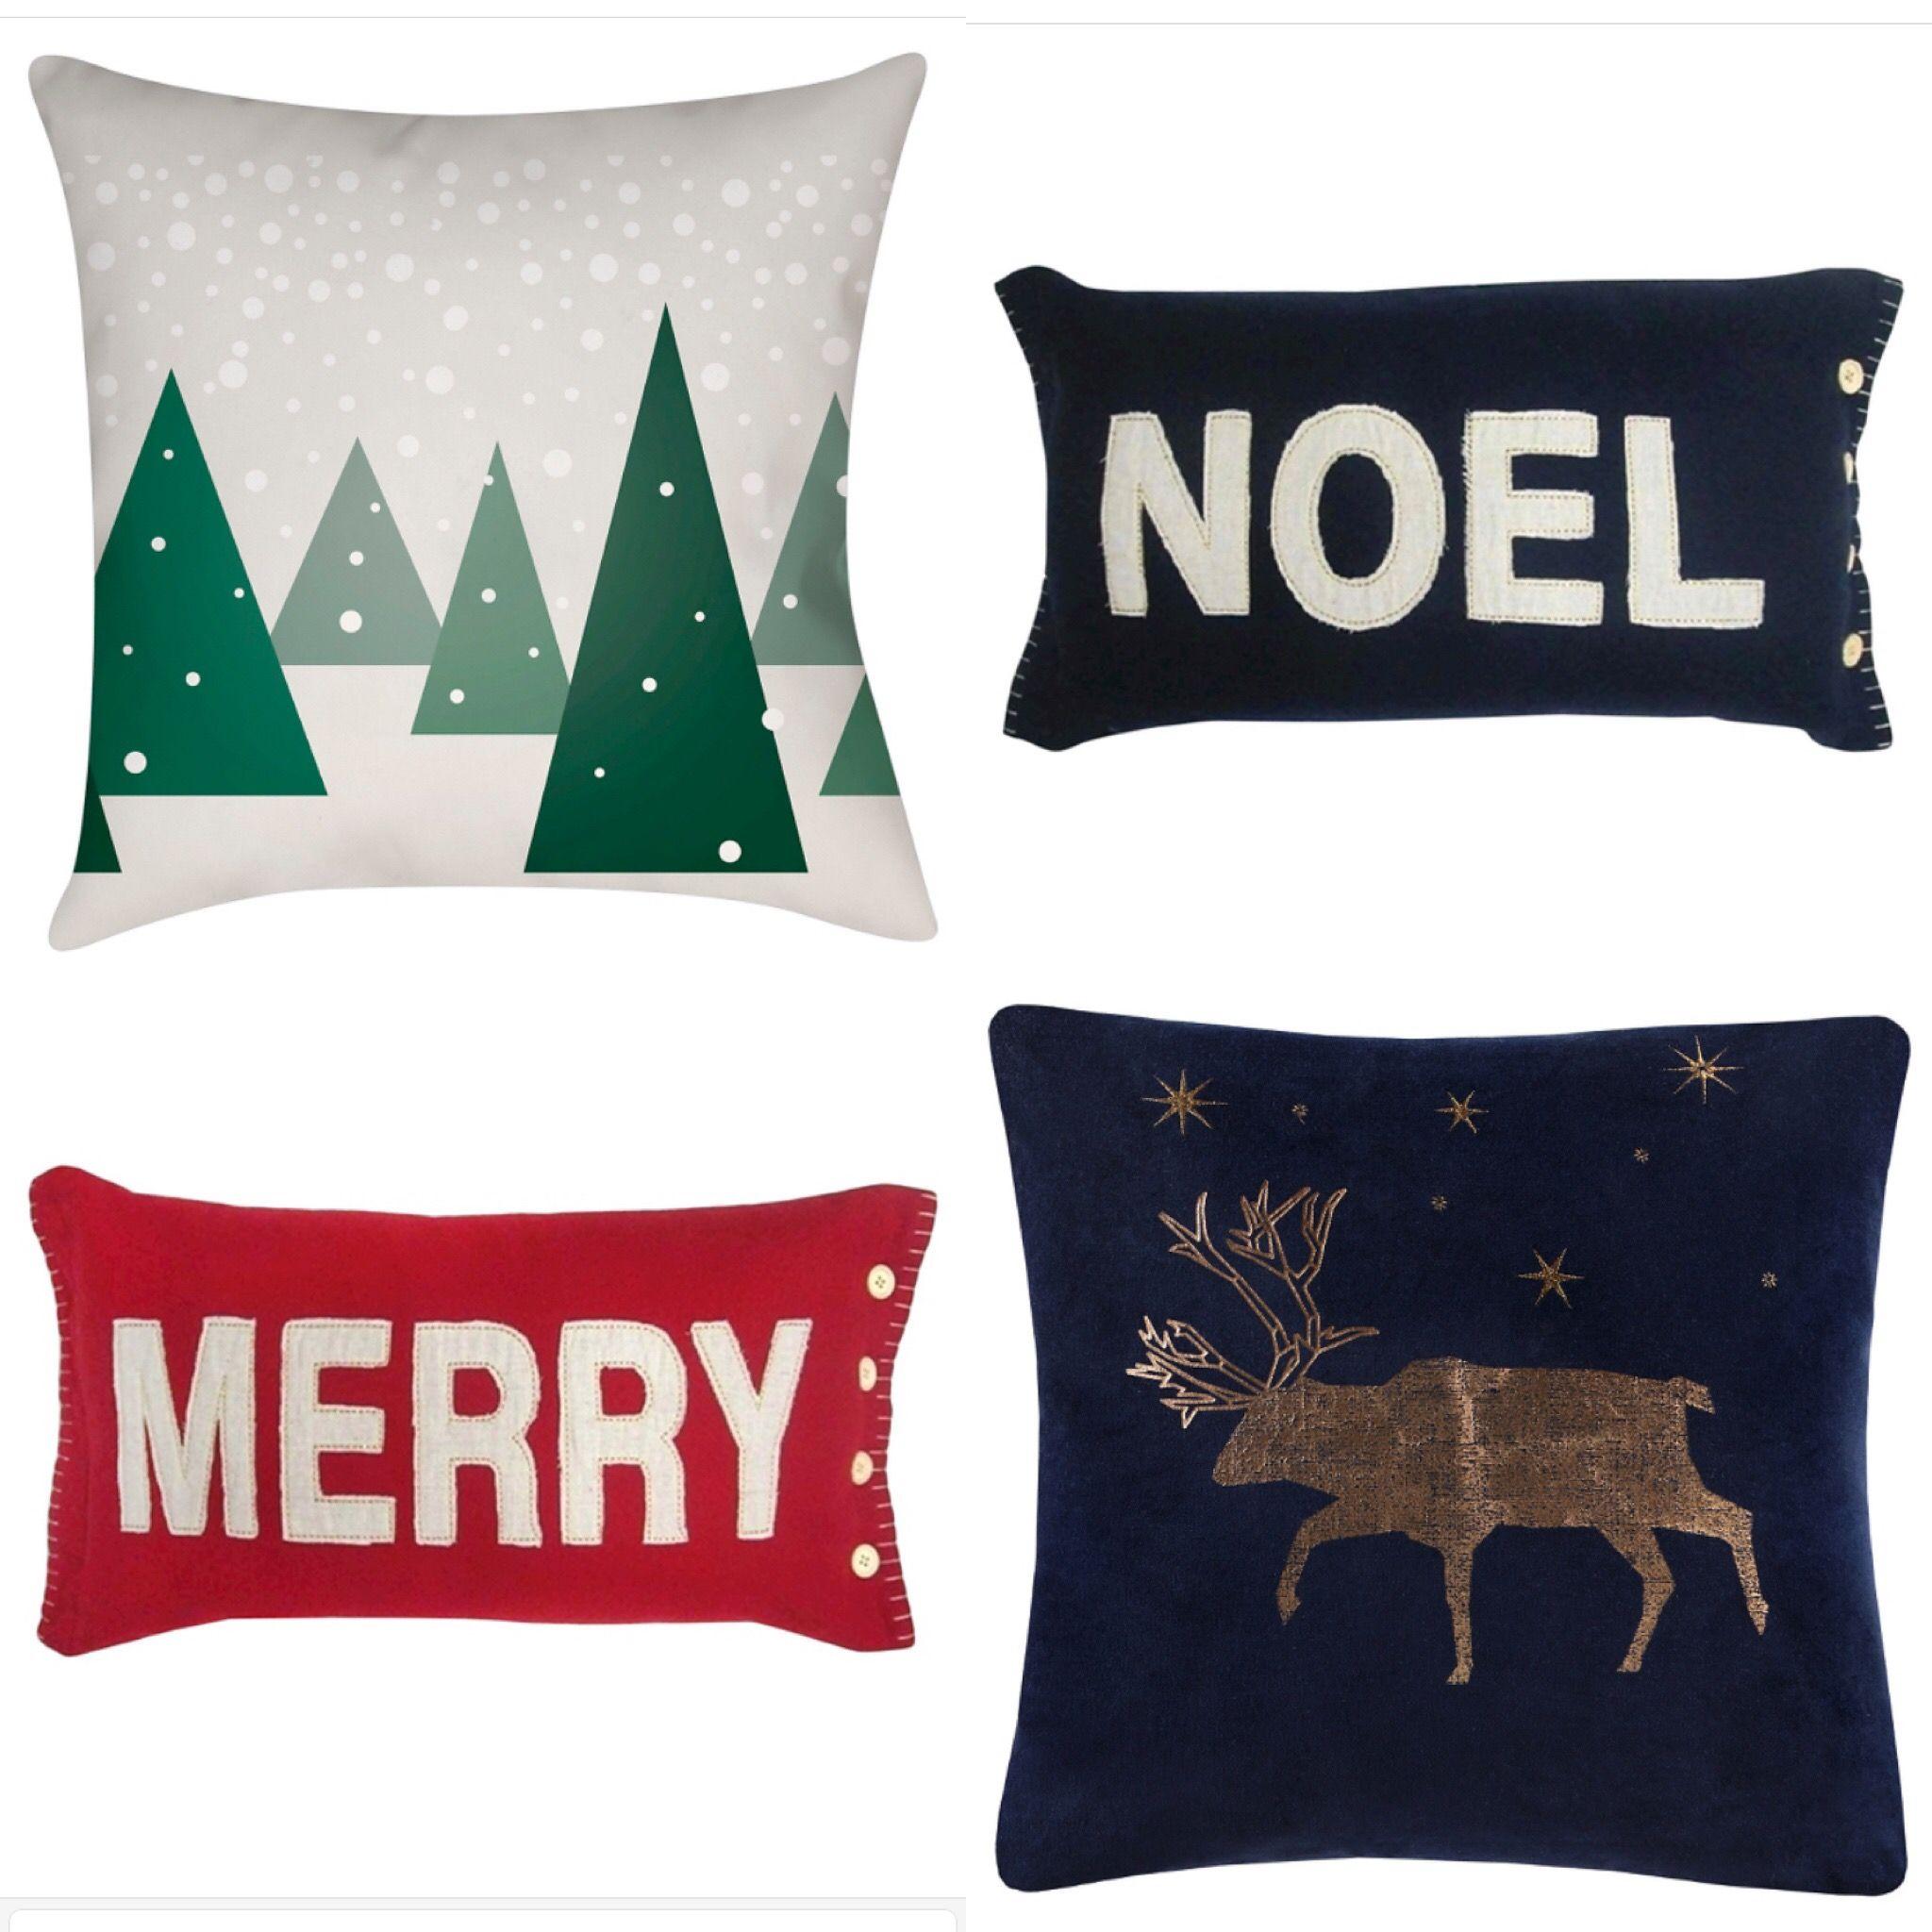 Target Christmas Pillows   Pillows, Bed pillows, Christmas ...